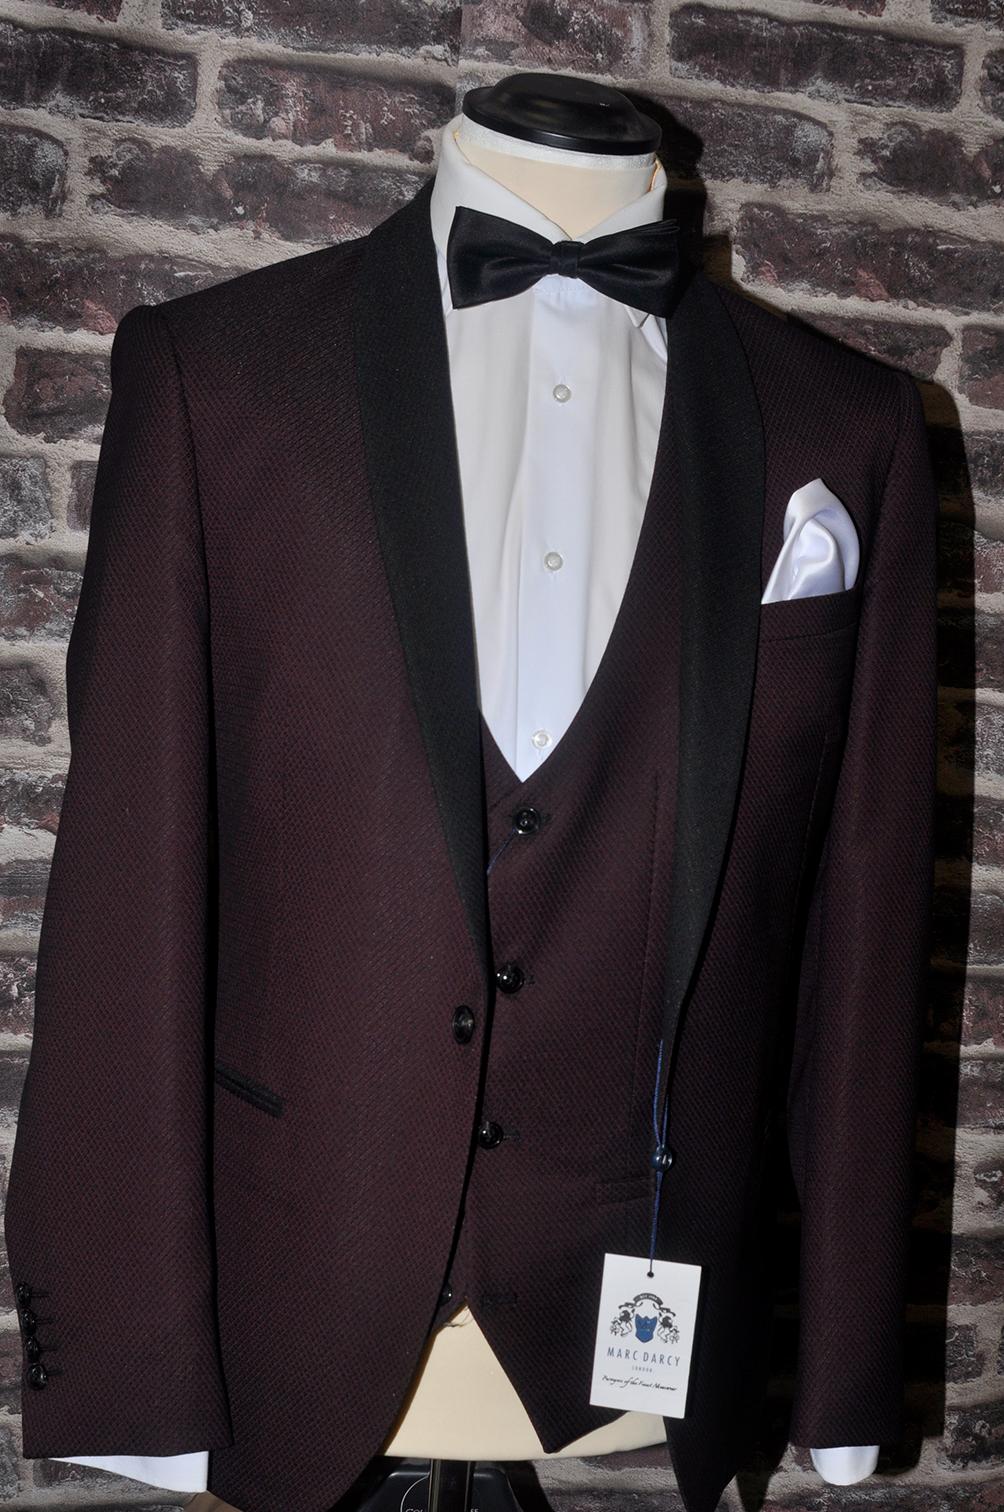 Burgundy Textured Shawl Lapel Tuxedo